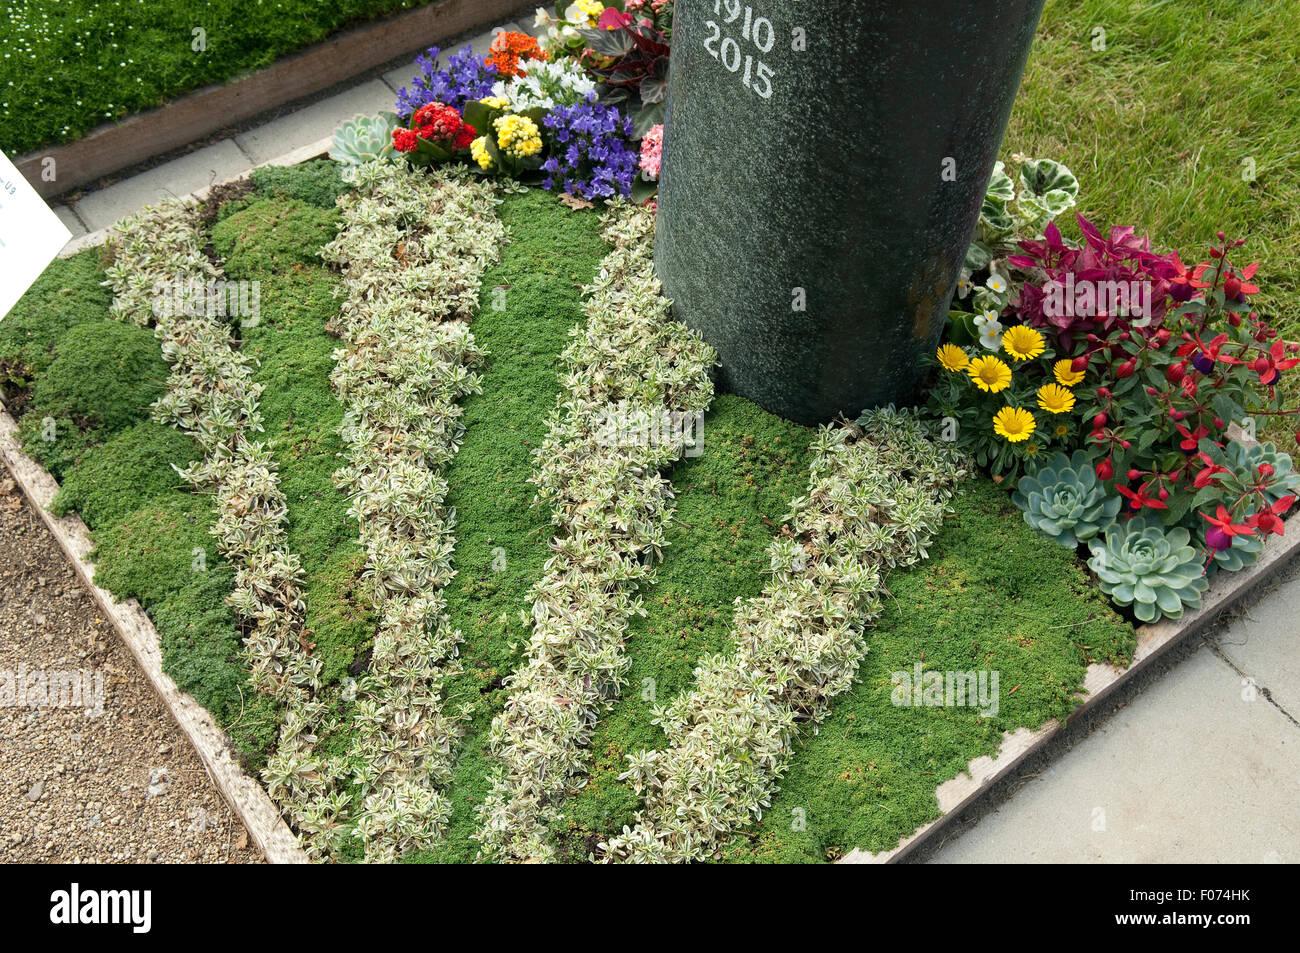 grabbepflanzung sand thymian thymus serpyllum stockfoto bild 86209135 alamy. Black Bedroom Furniture Sets. Home Design Ideas